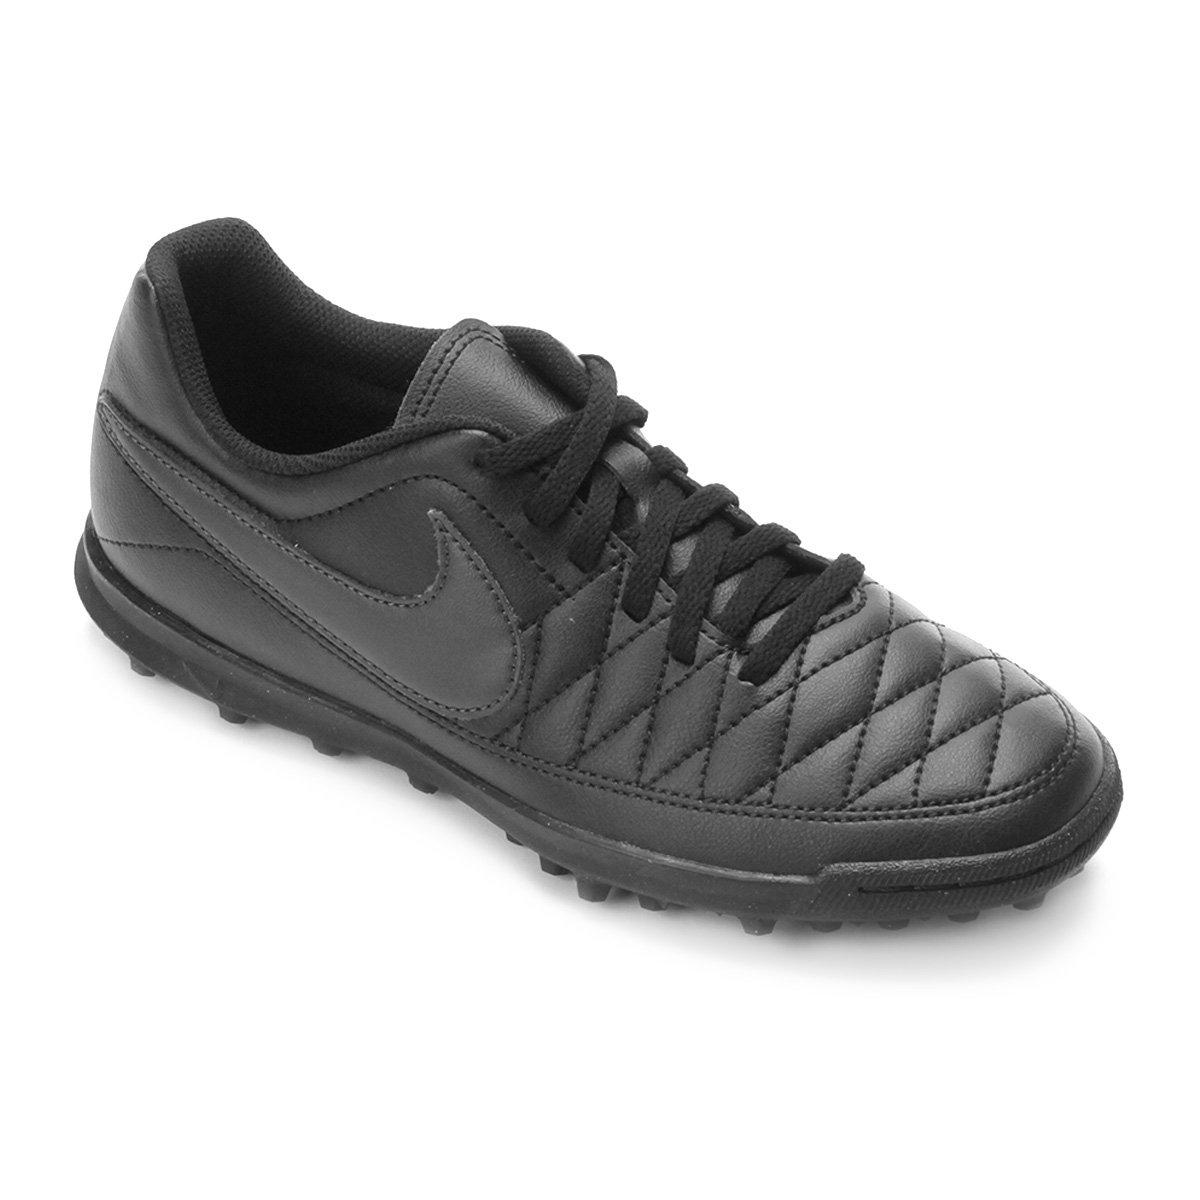 Chuteira Society Nike Majestry TF - Preto